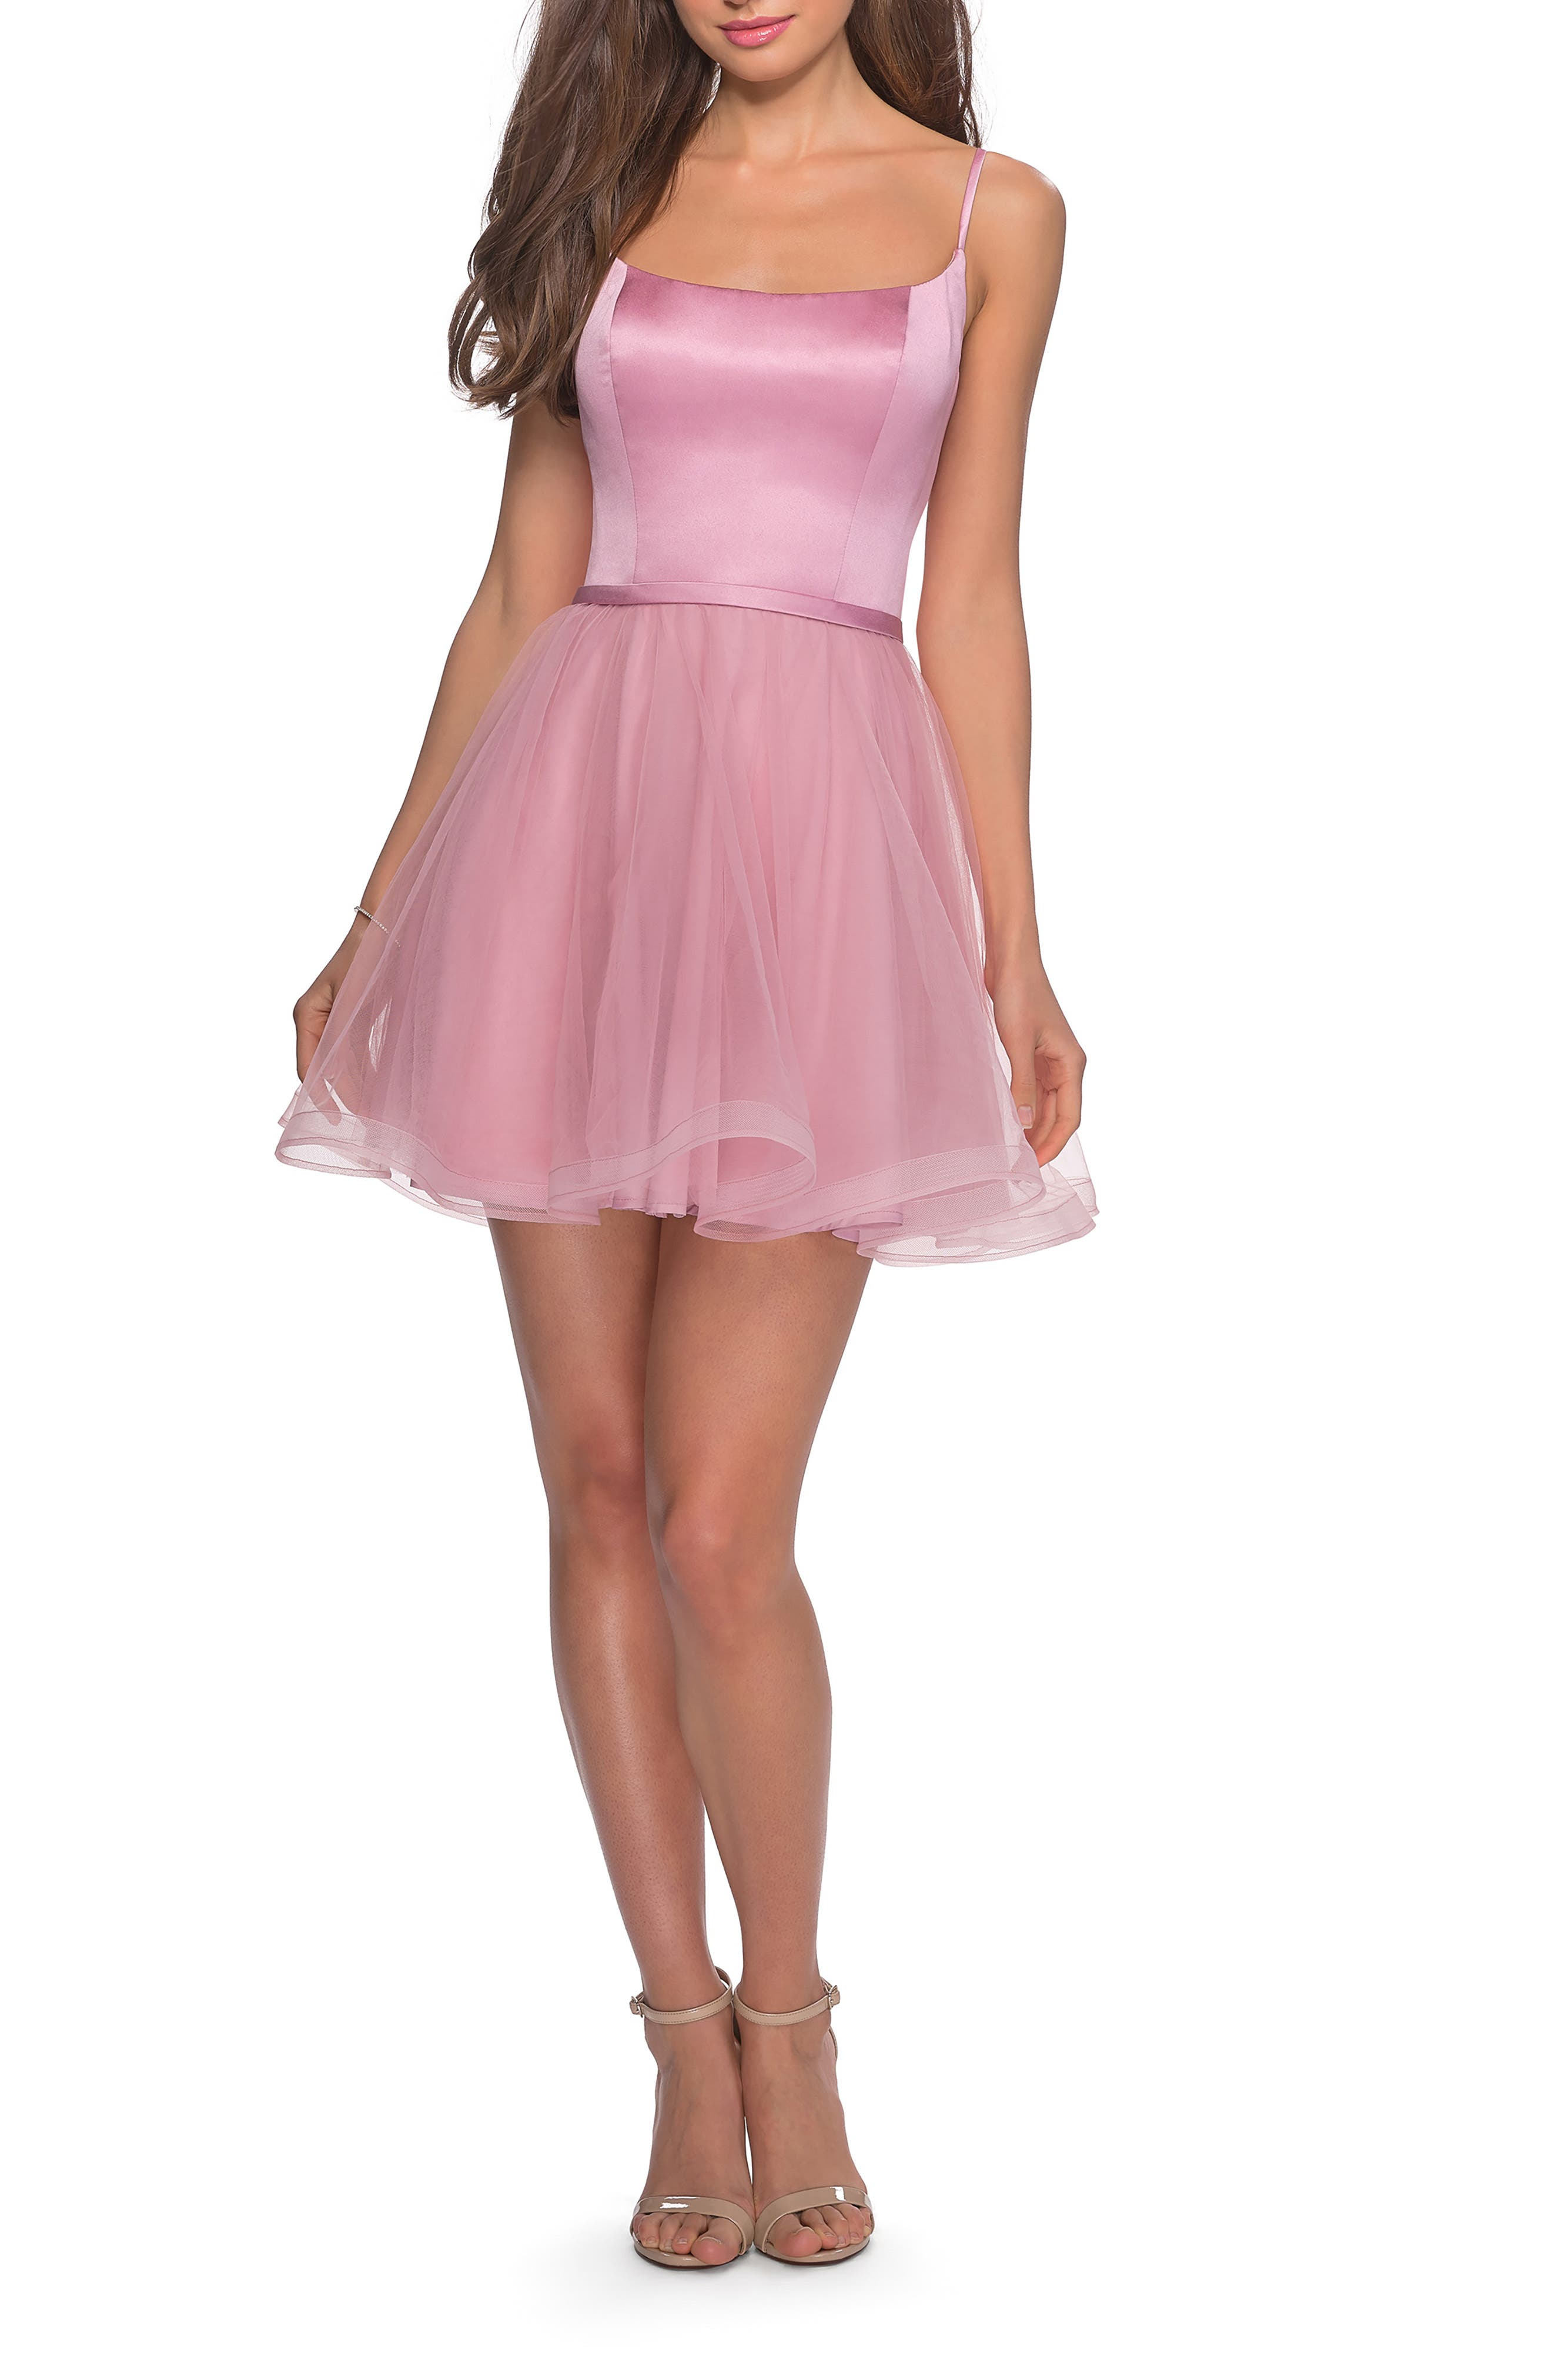 La Femme Satin & Tulle Fit & Flare Dress